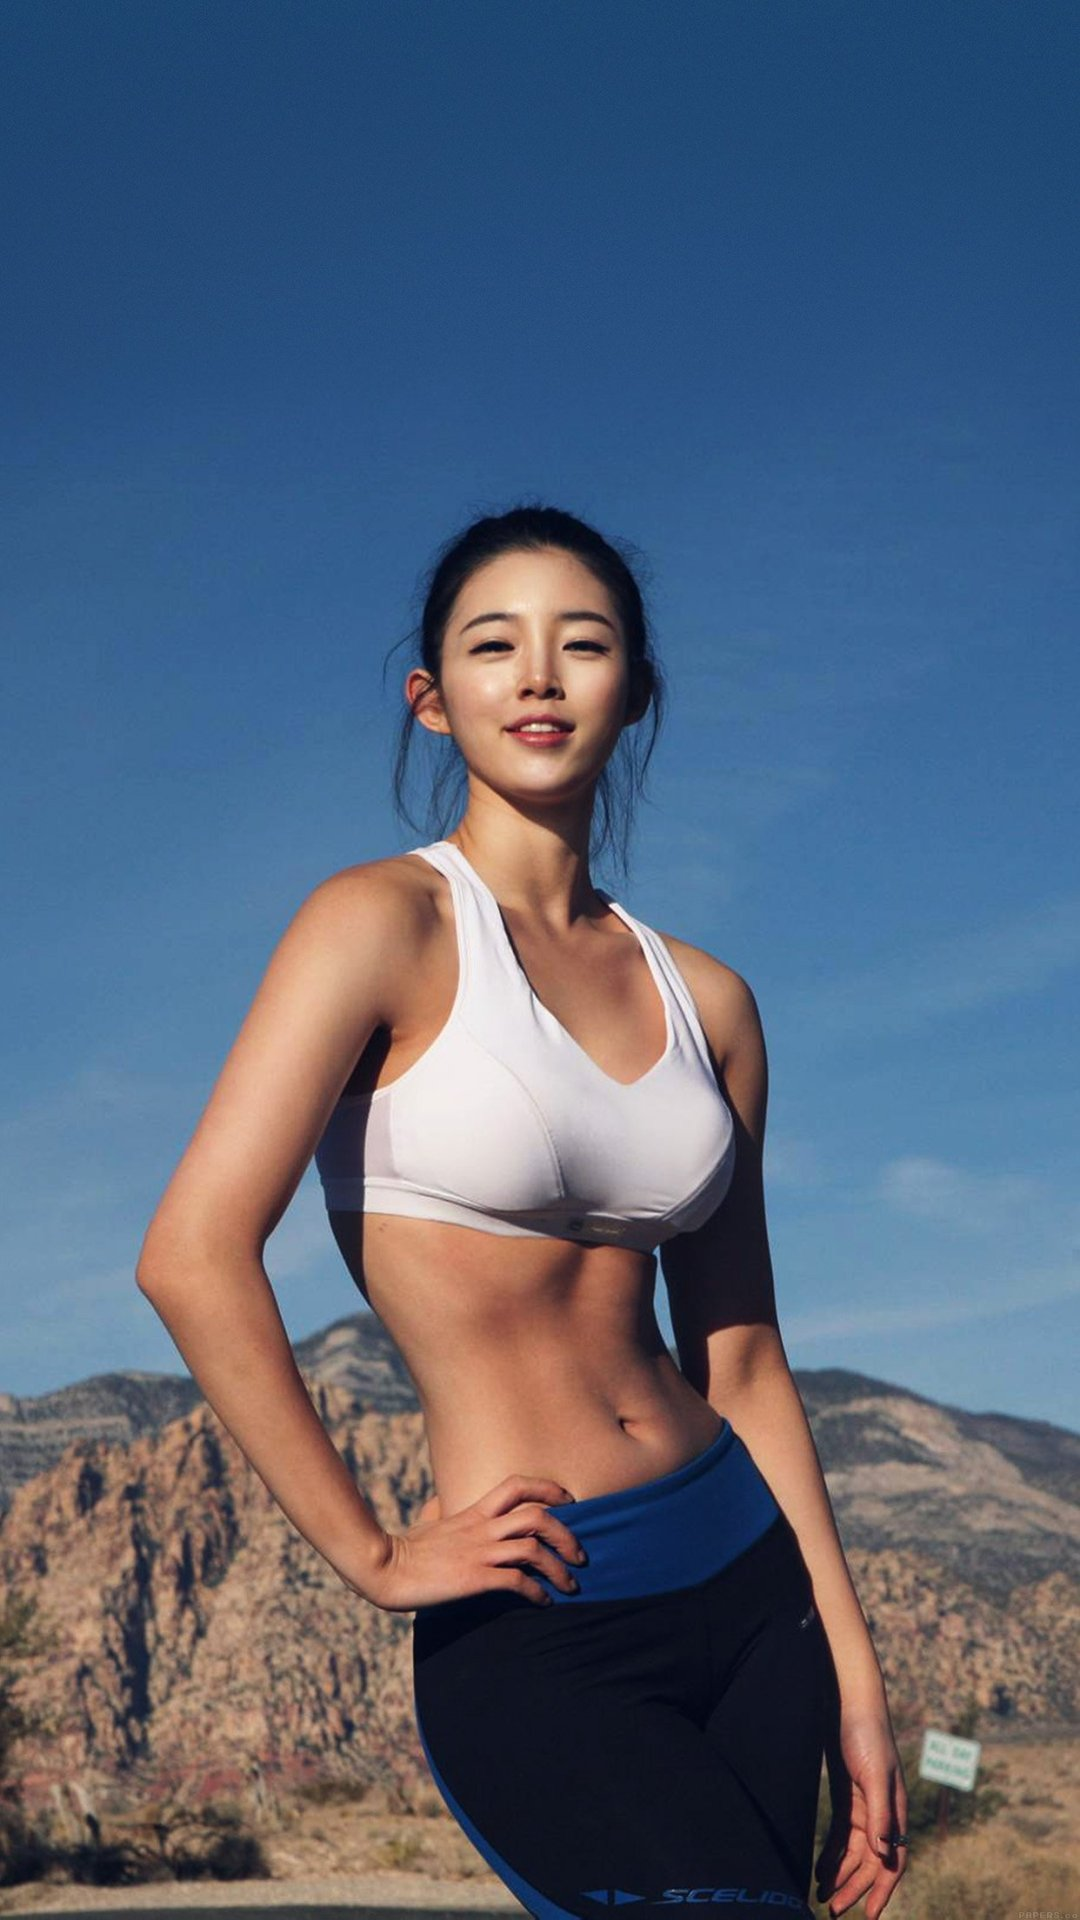 Sexy Kpop Star Iphone Wallpaper